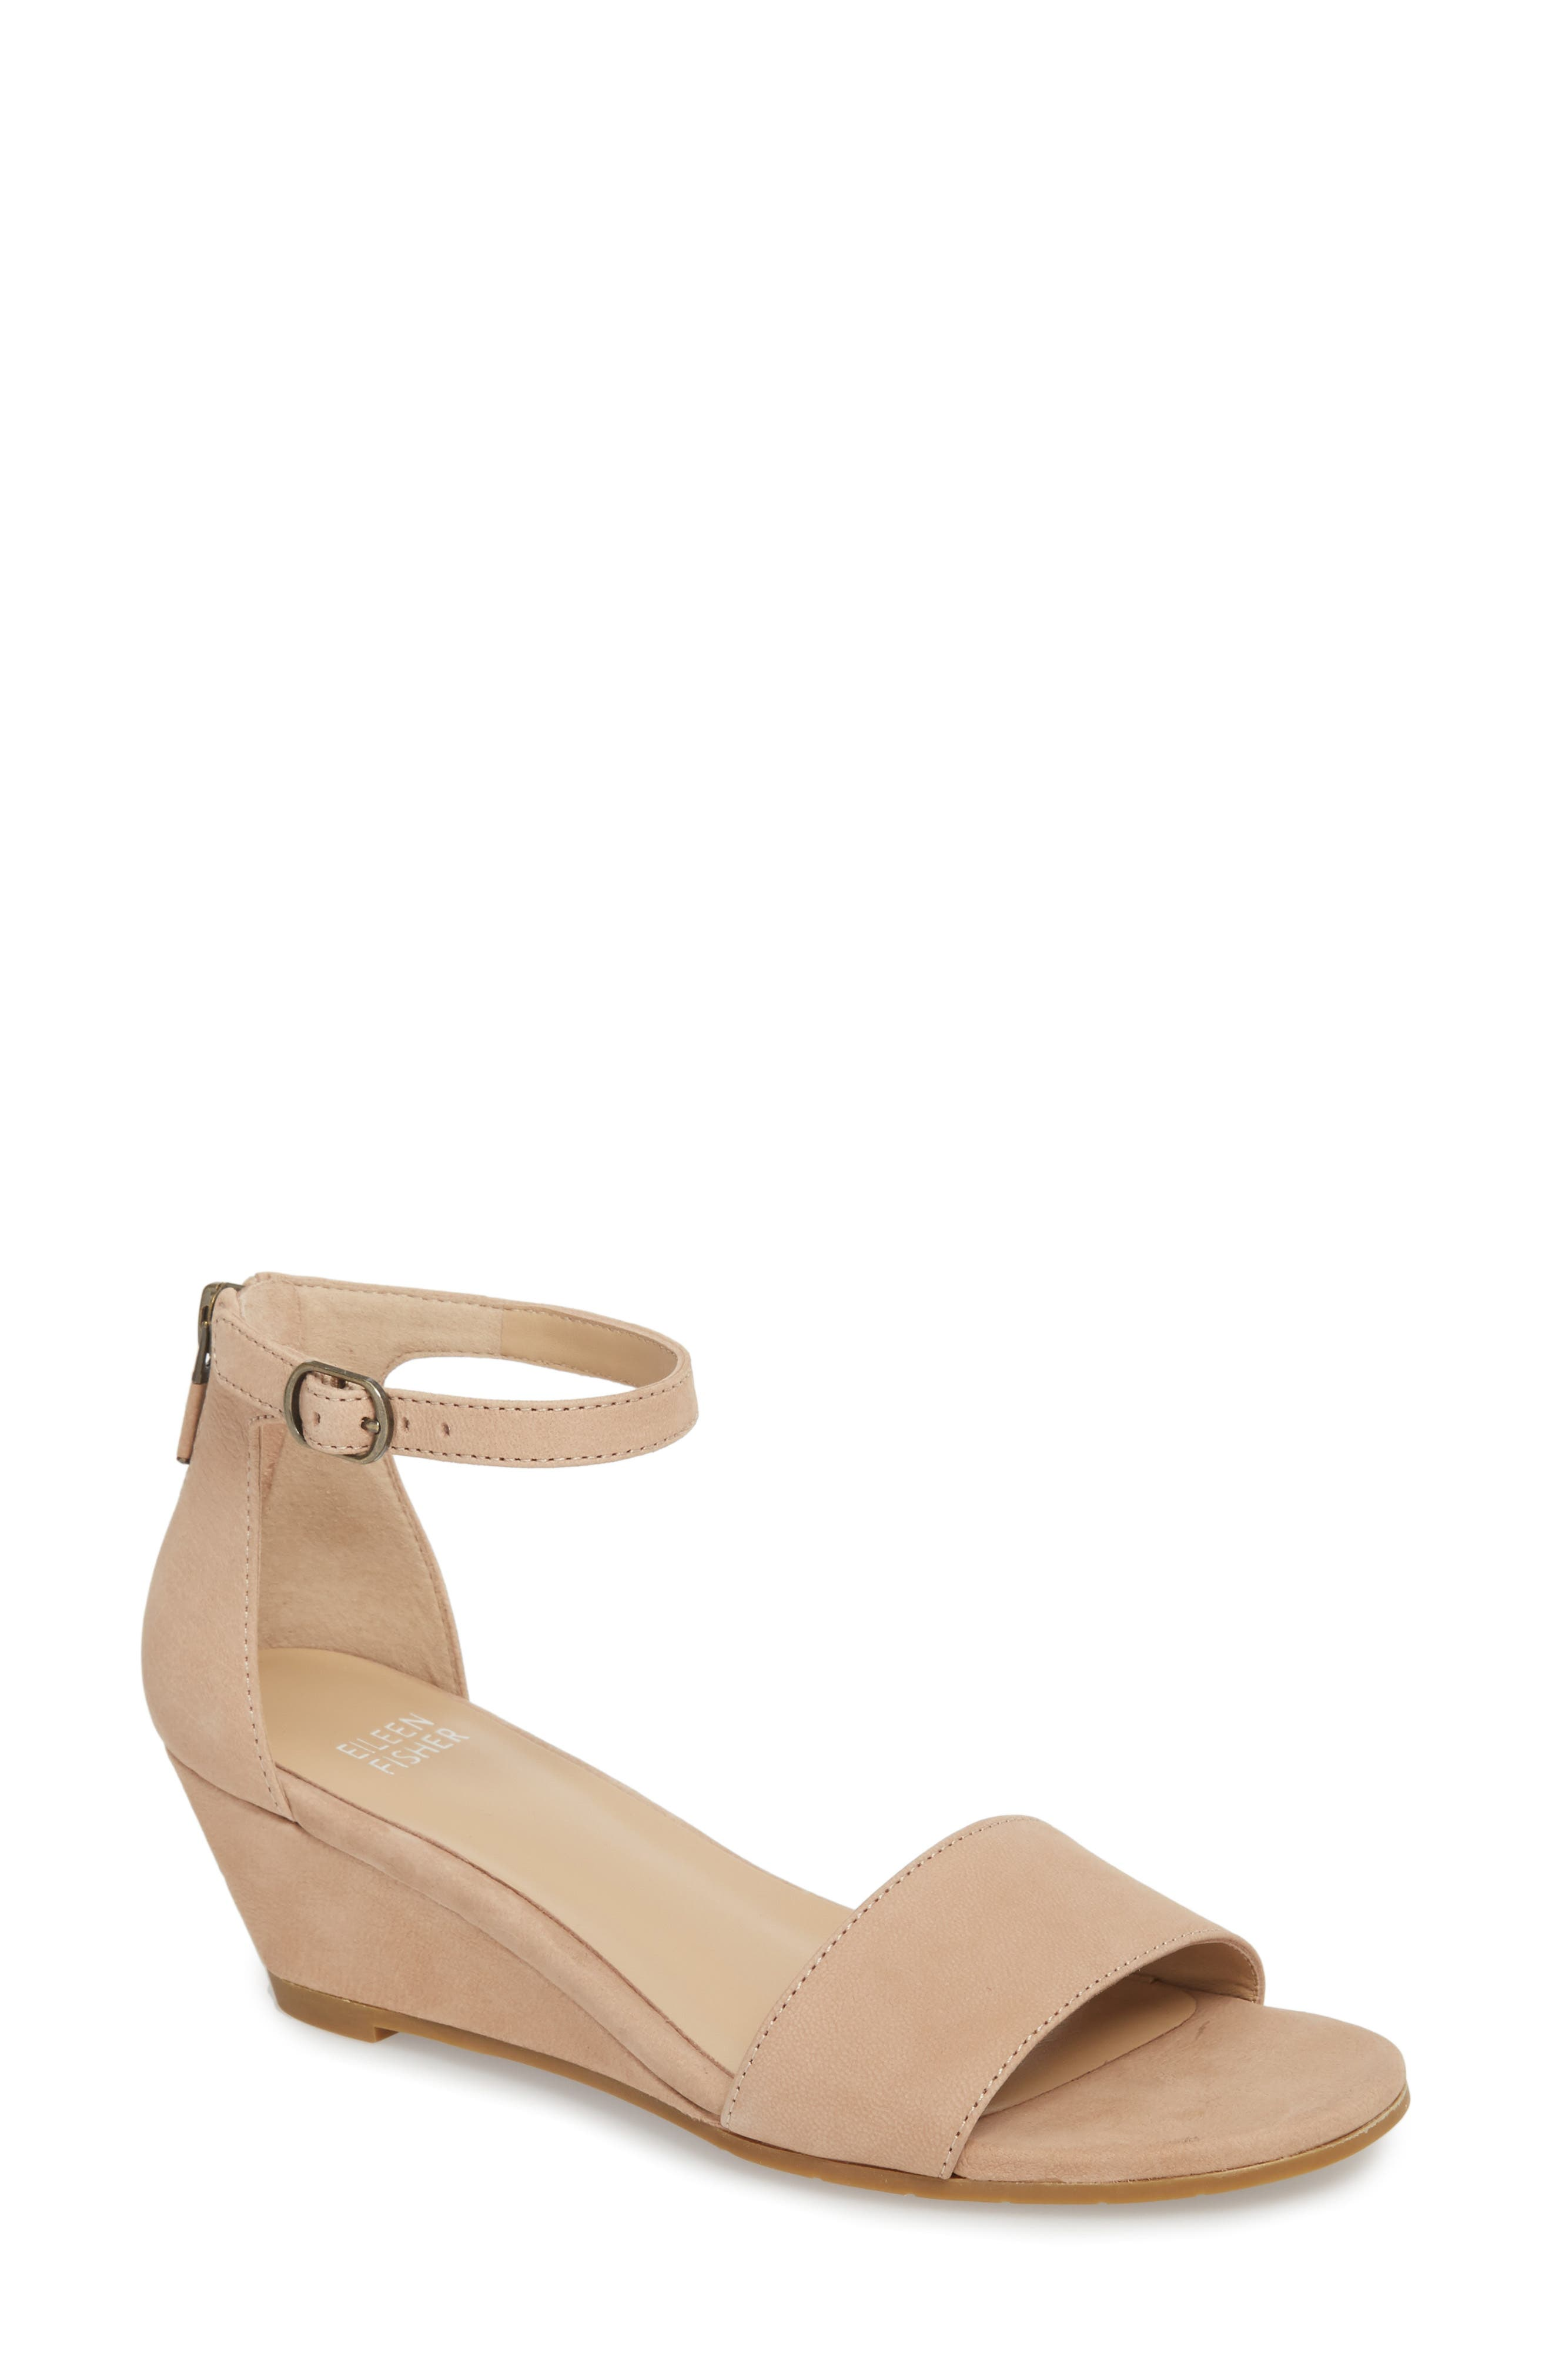 Mara Ankle Strap Wedge Sandal,                             Main thumbnail 3, color,